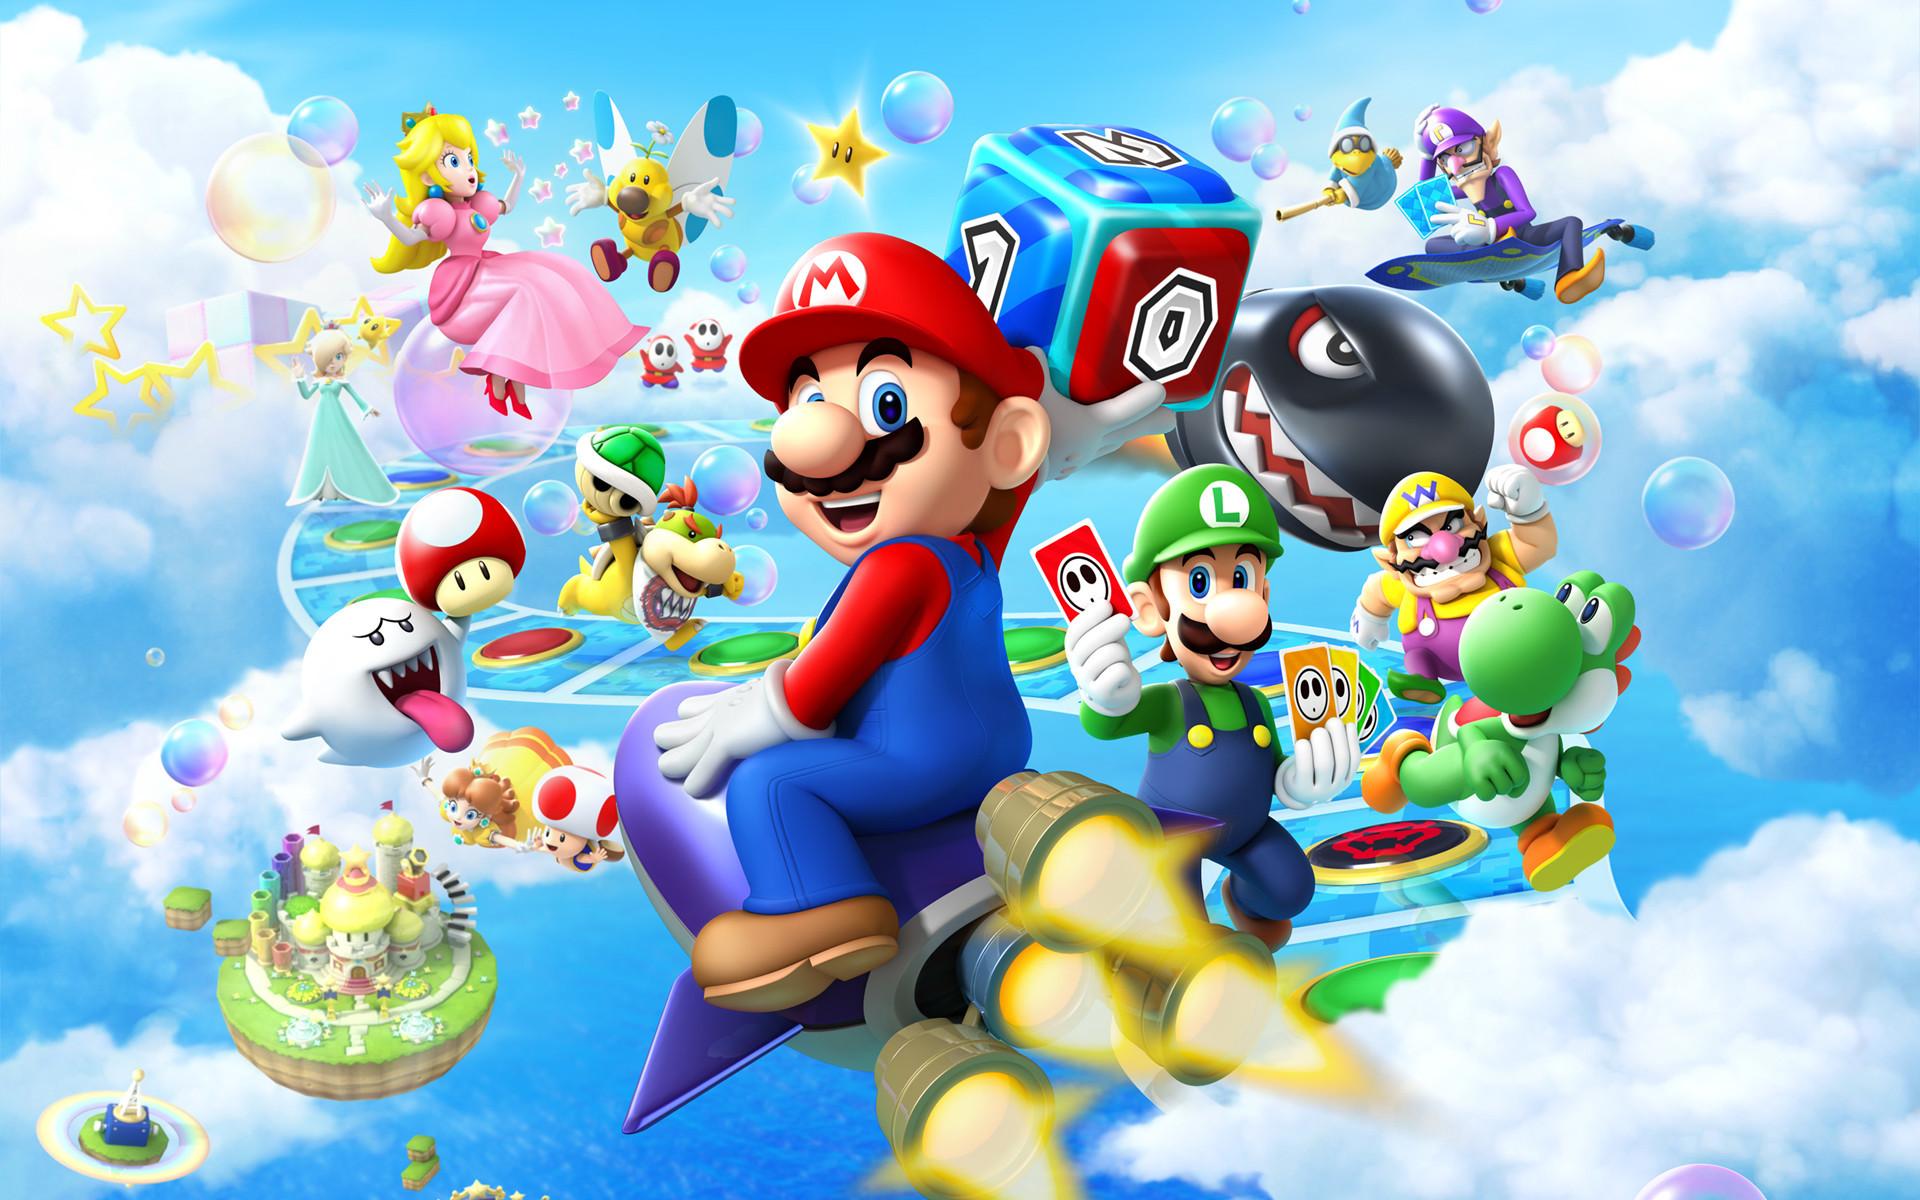 Super Mario Galaxy Wallpapers: Super Mario Galaxy 2 Wallpaper HD (77+ Images